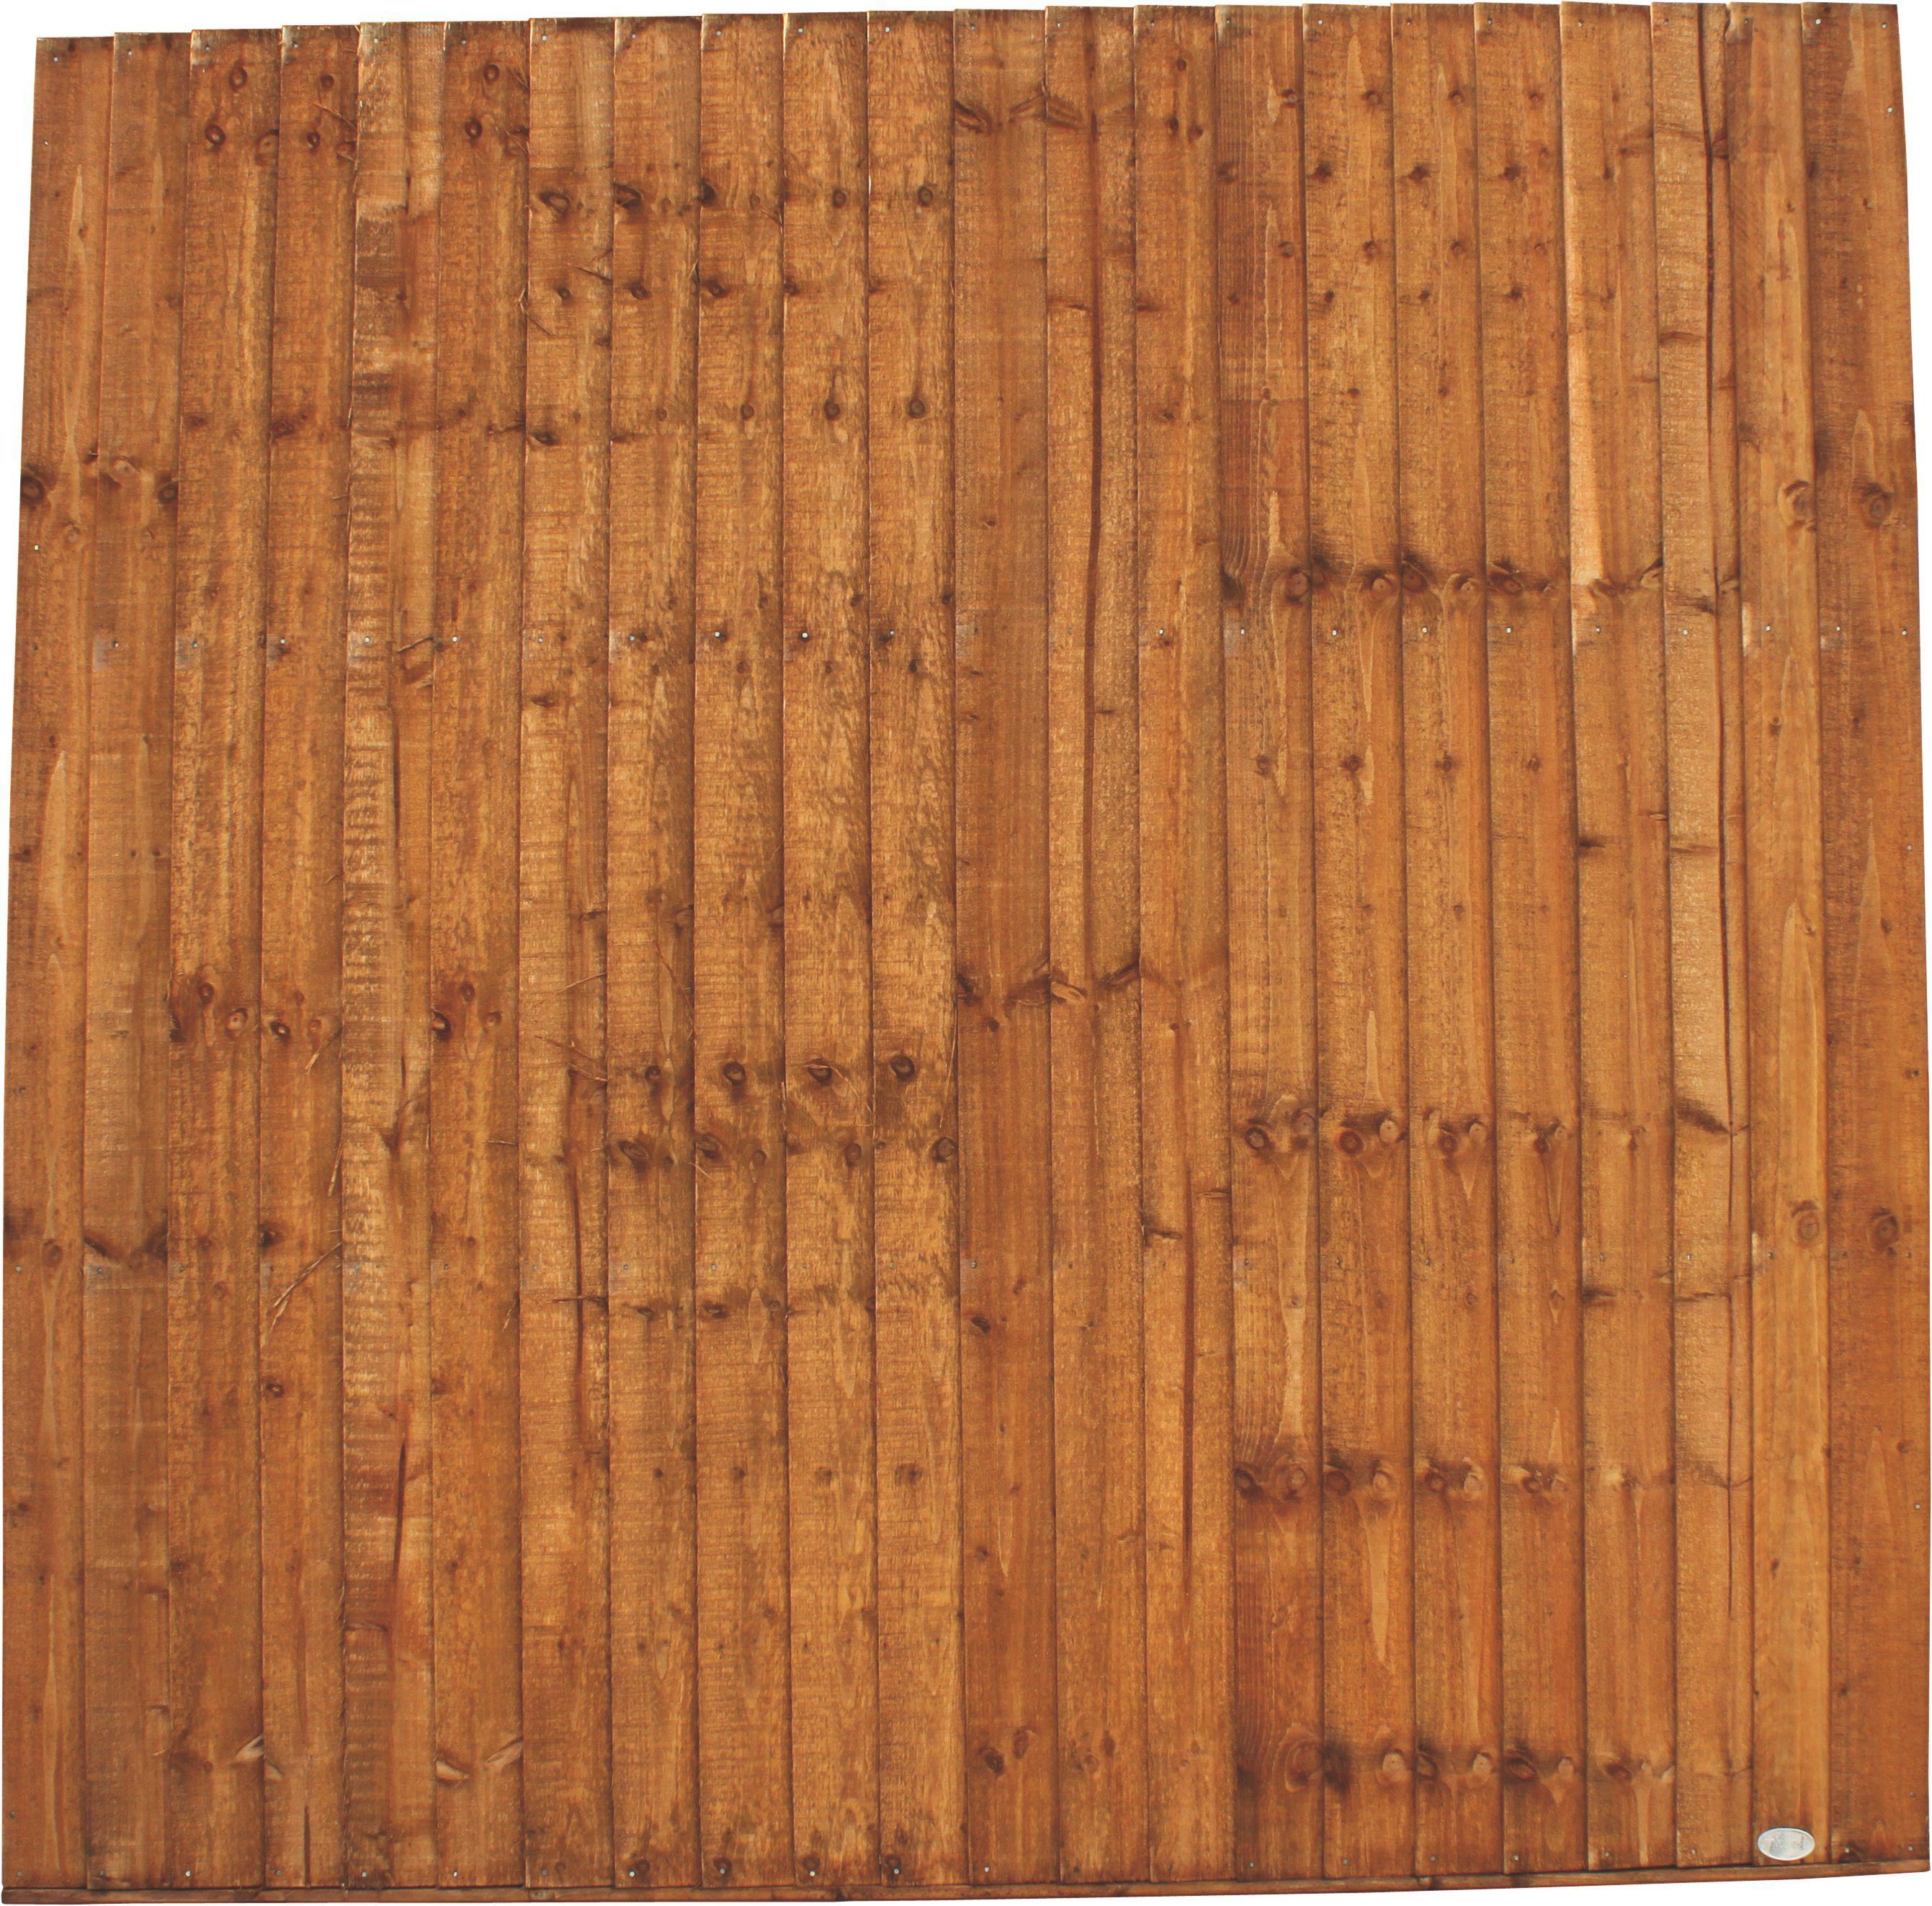 Superior closeboard fence panel w183m h15m departments fence panel baanklon Choice Image